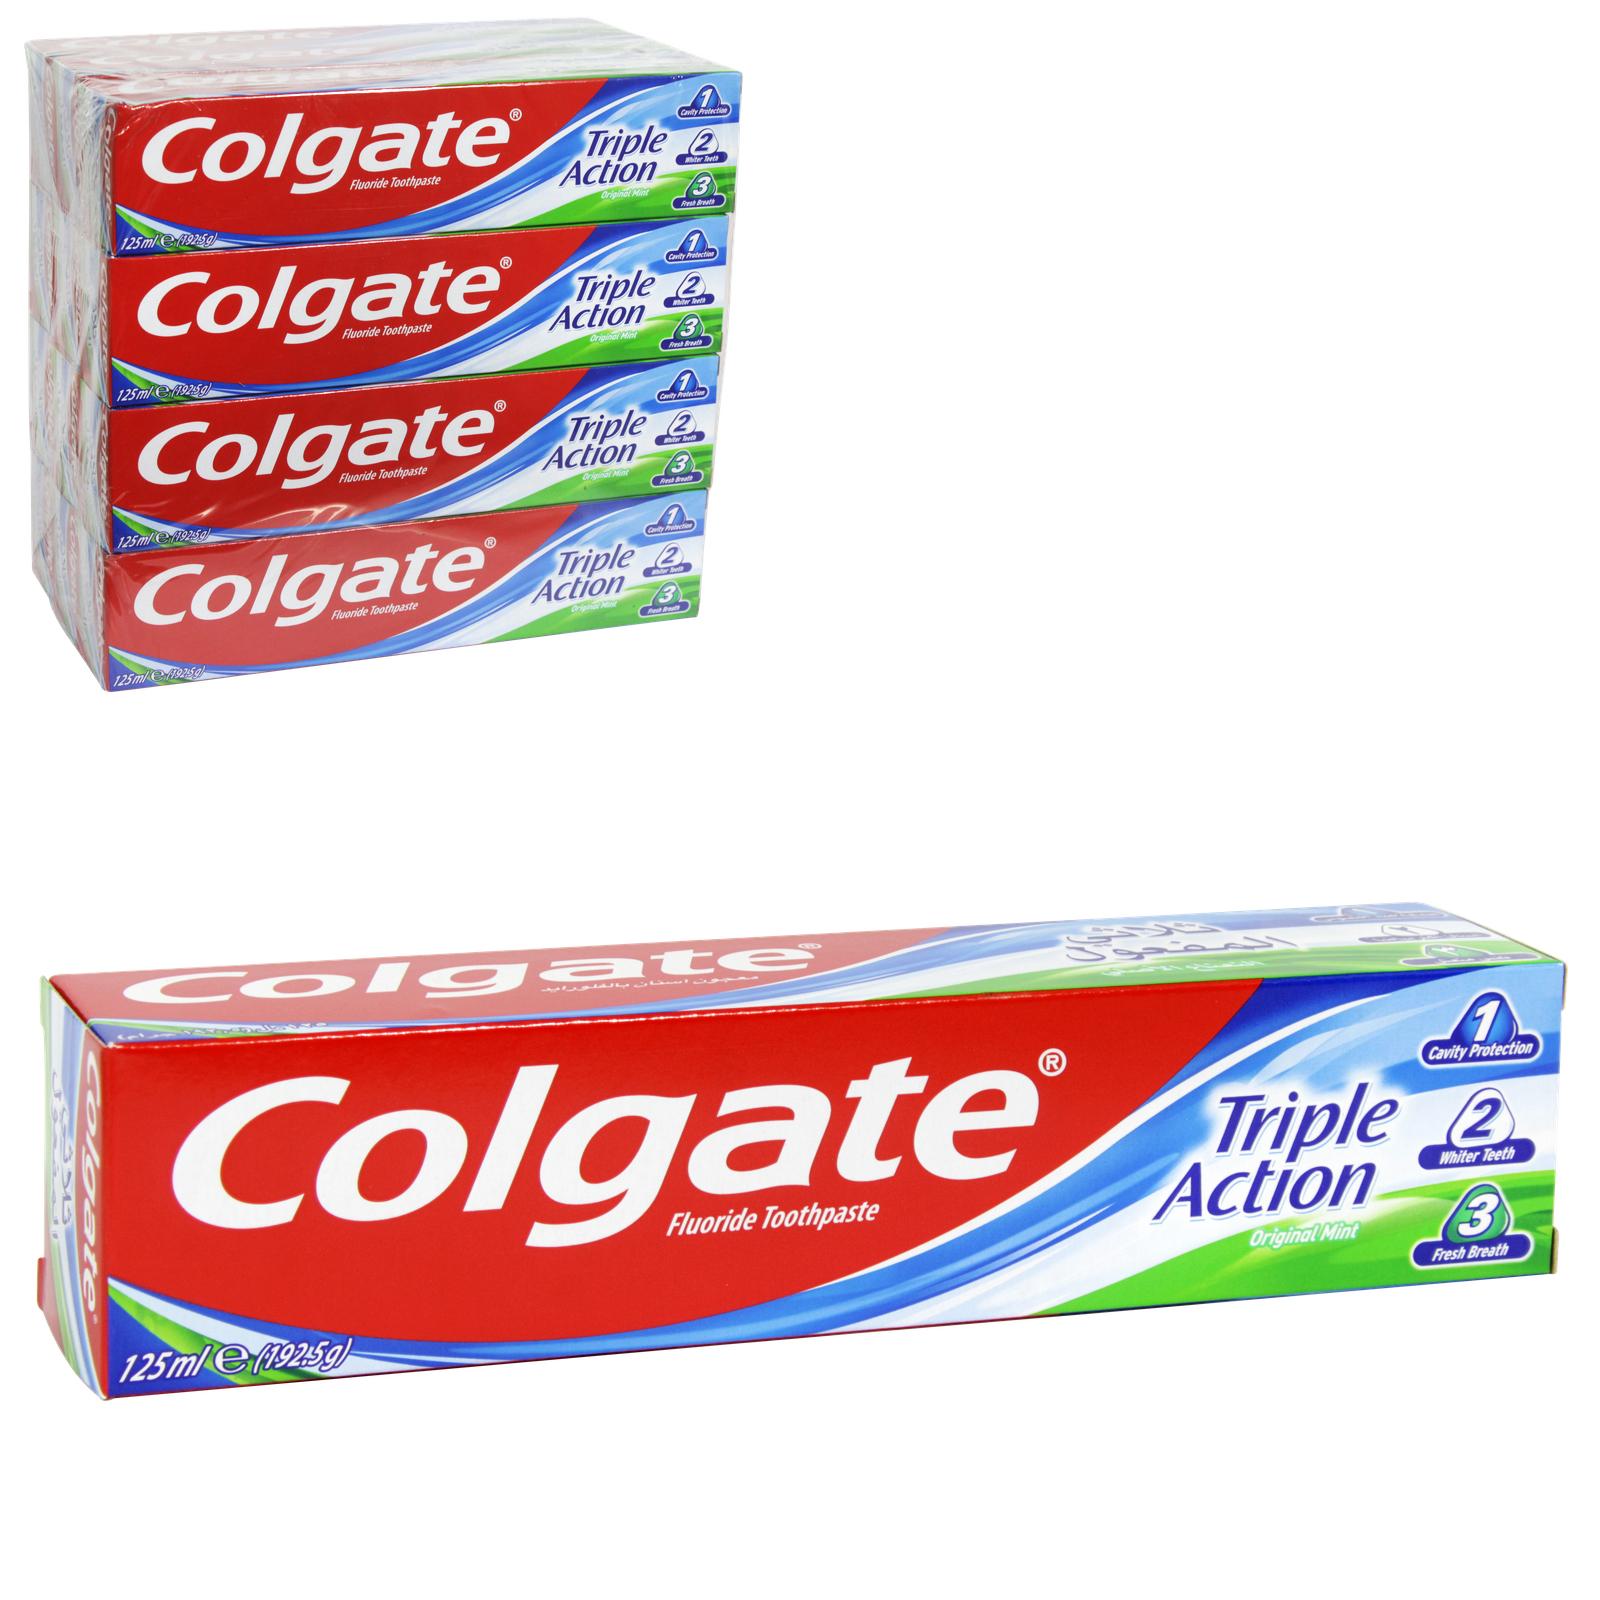 COLGATE TOOTHPASTE 100ML TRIPLE ACTION X12